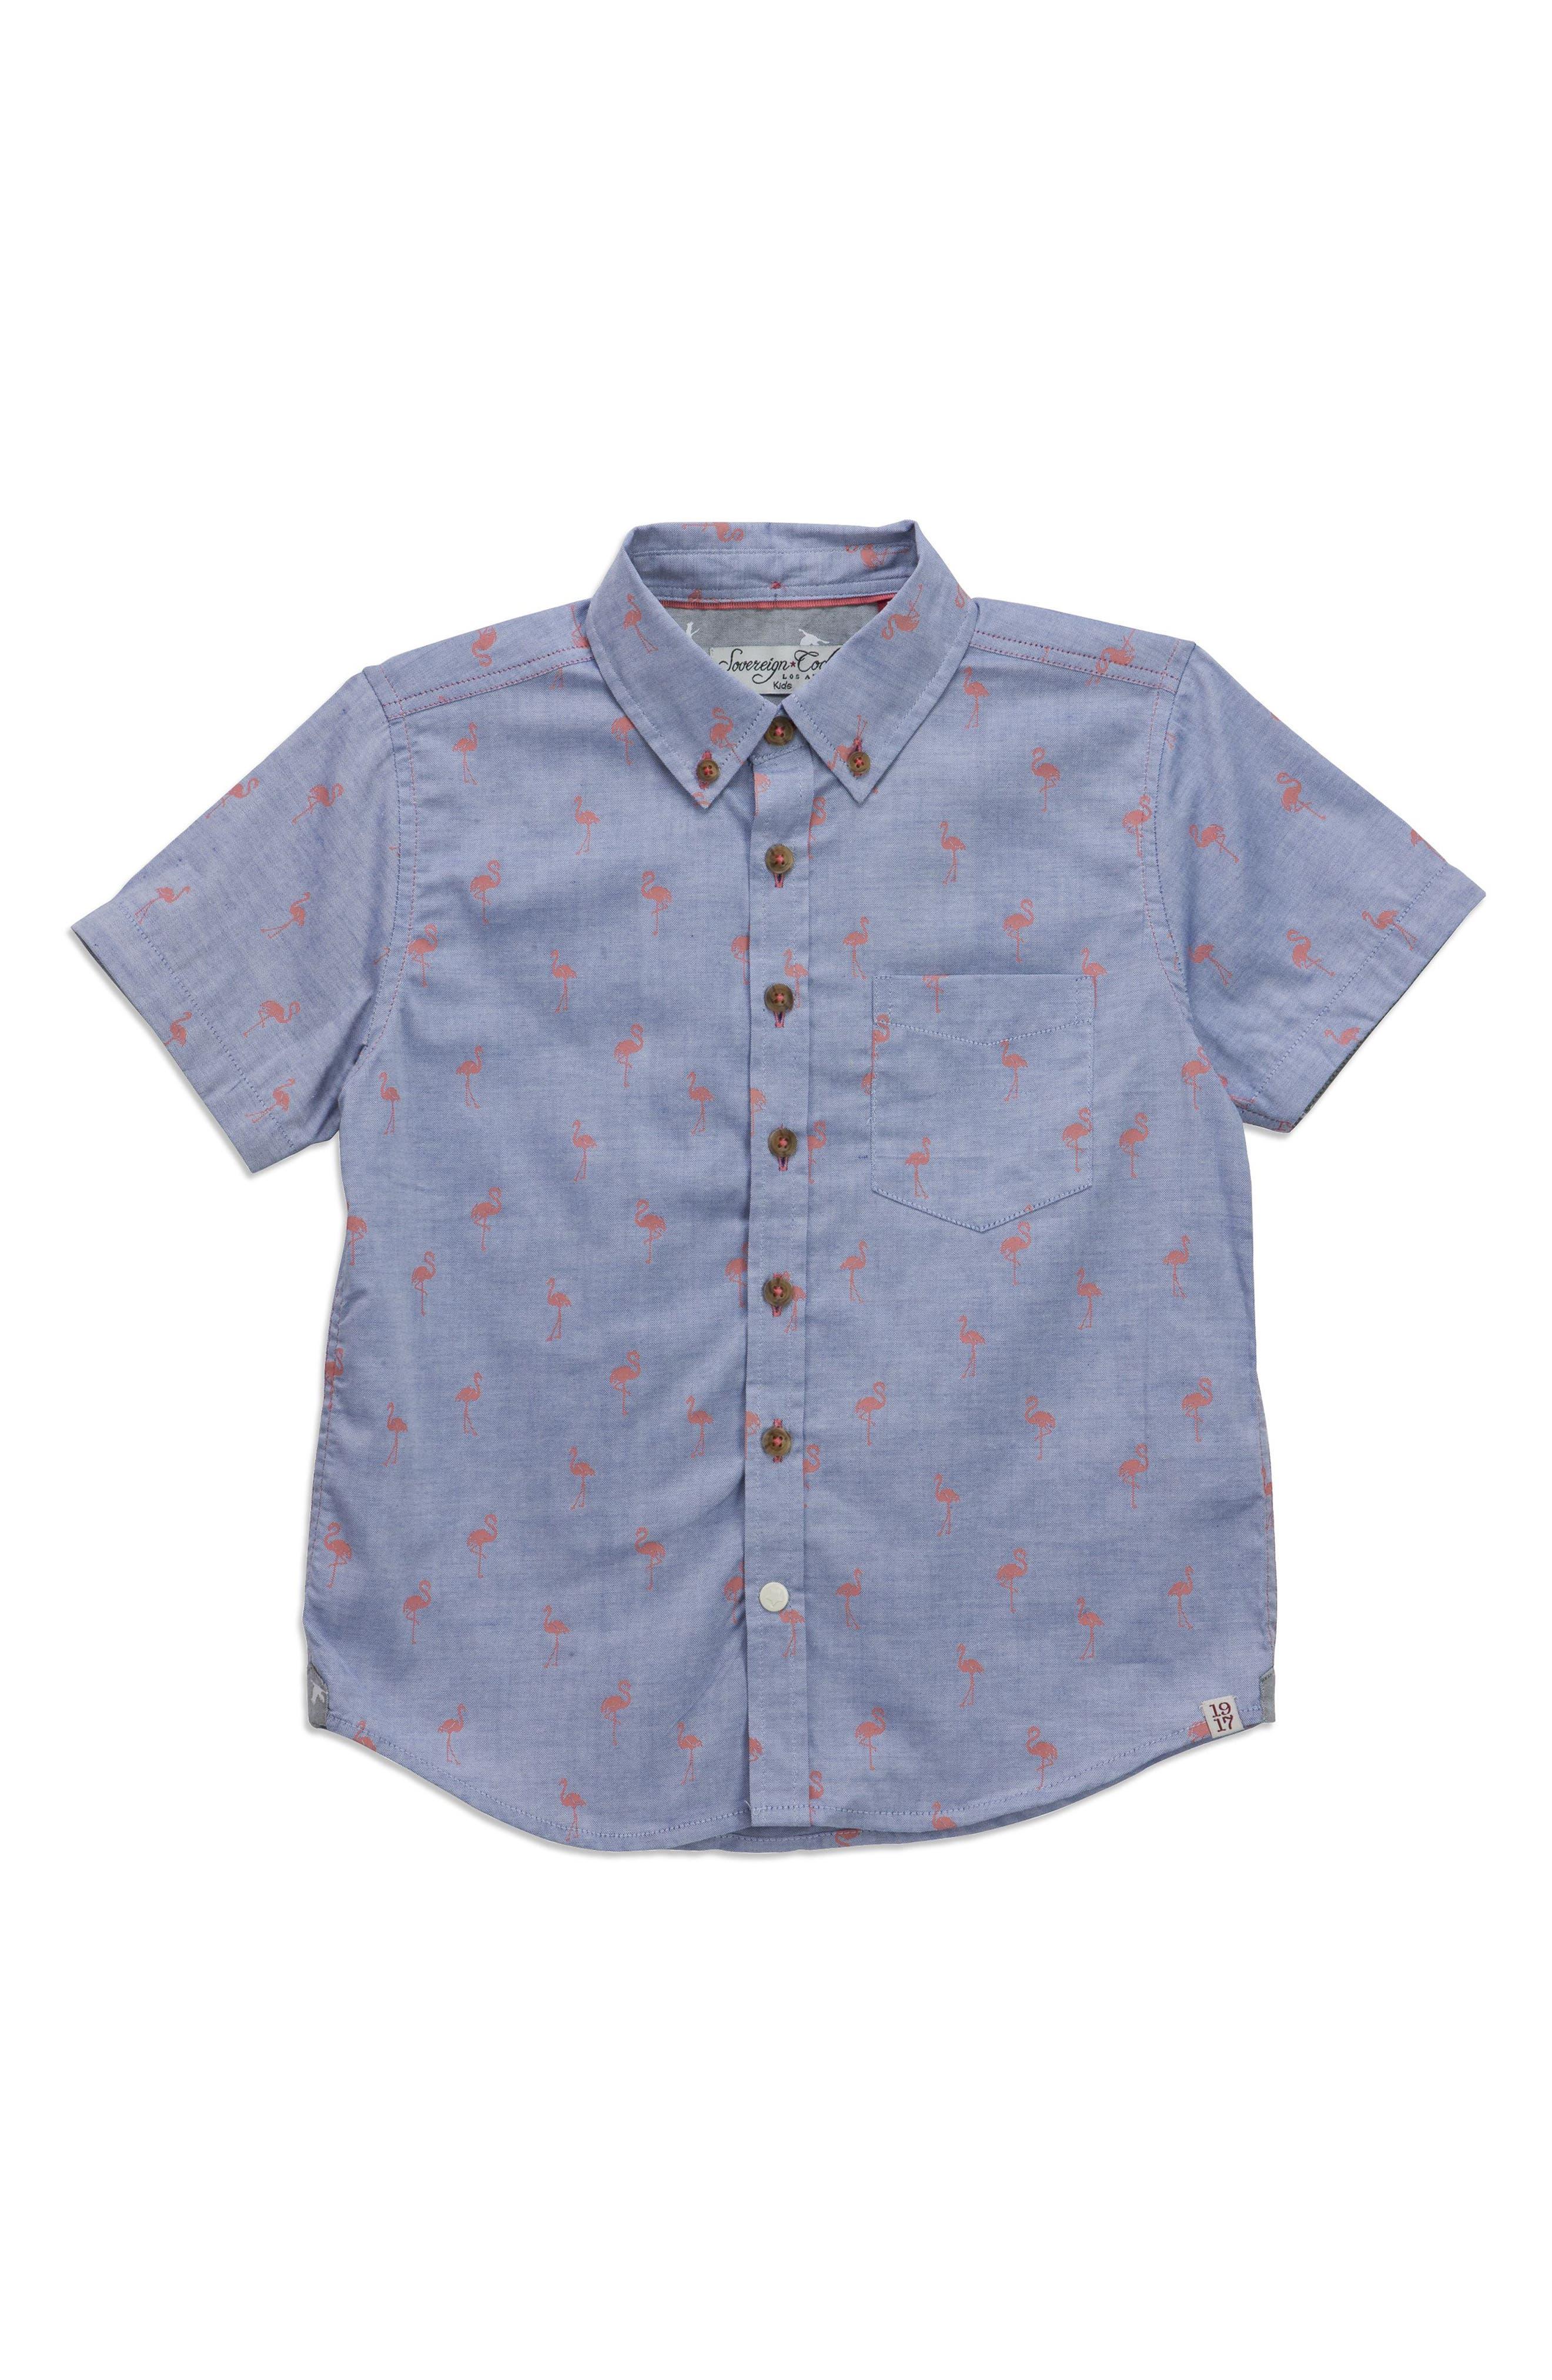 SOVEREIGN CODE,                             Crystal Cove Woven Shirt,                             Main thumbnail 1, color,                             410